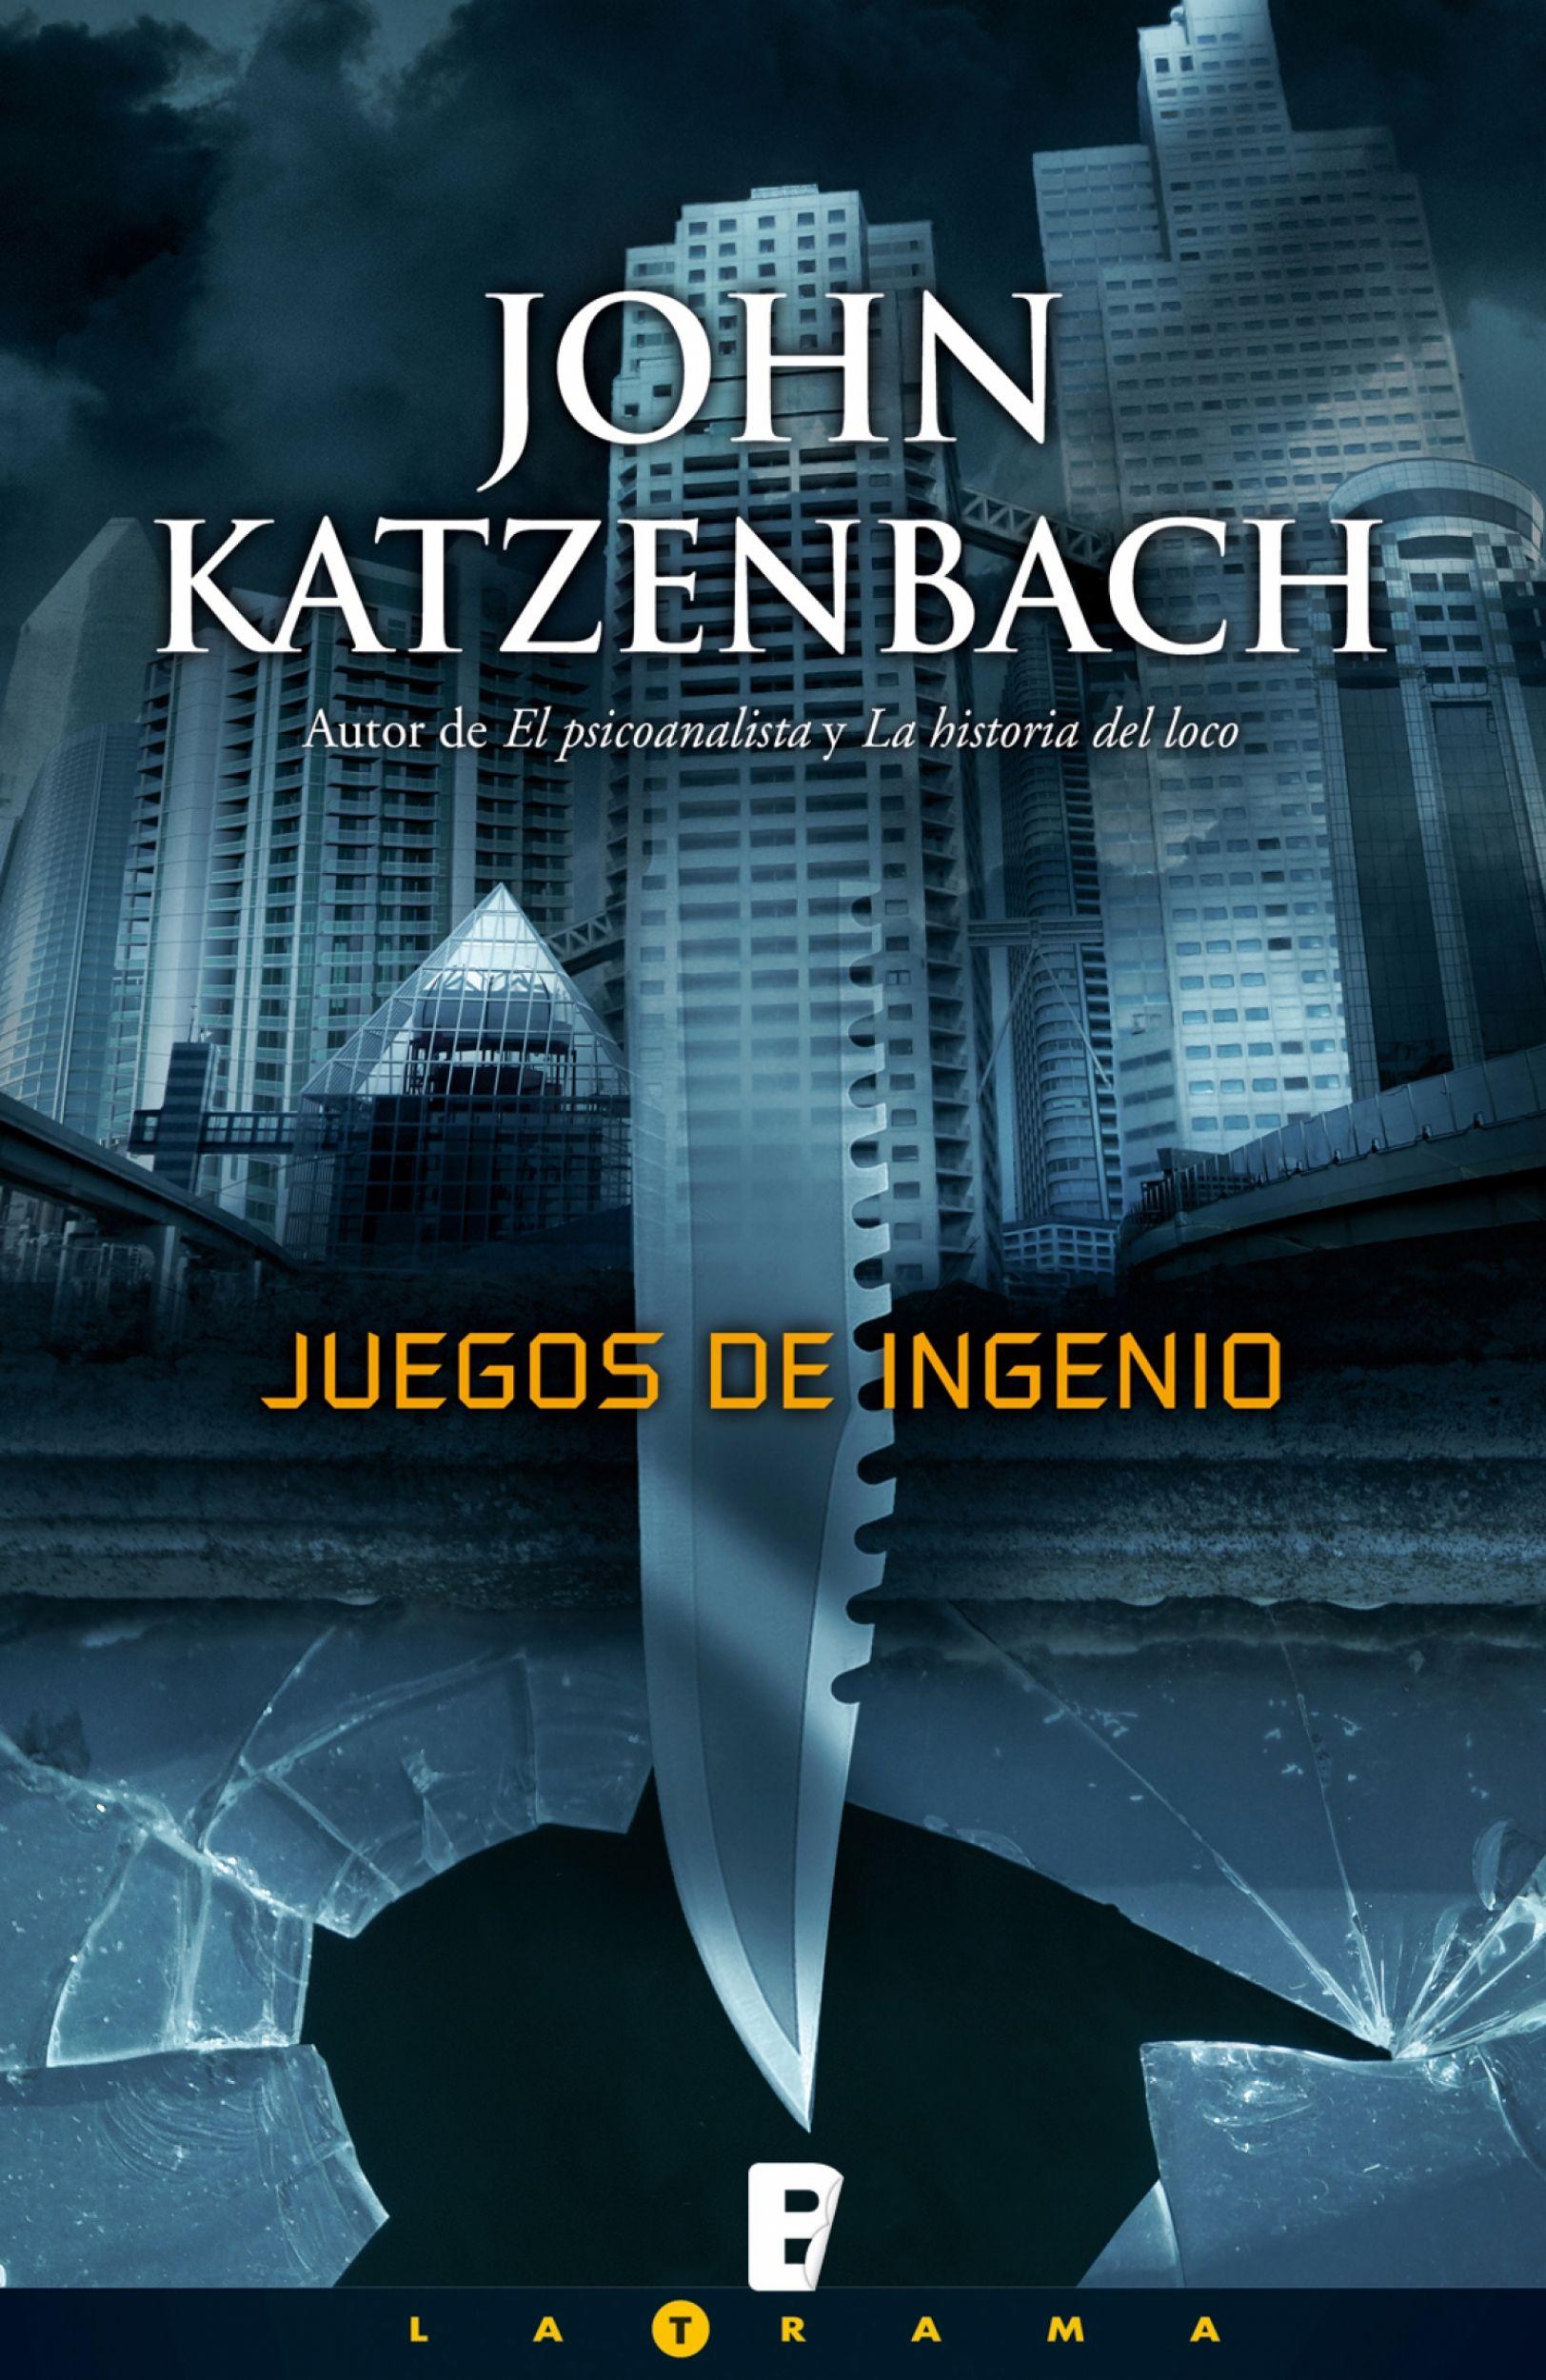 Descarga Juegos De Ingenio John Katzenbach Https Www Descargalibros Es Descarga Juegos De Ingenio Jo Libros De Suspenso Libros Suspenso Juegos De Ingenio